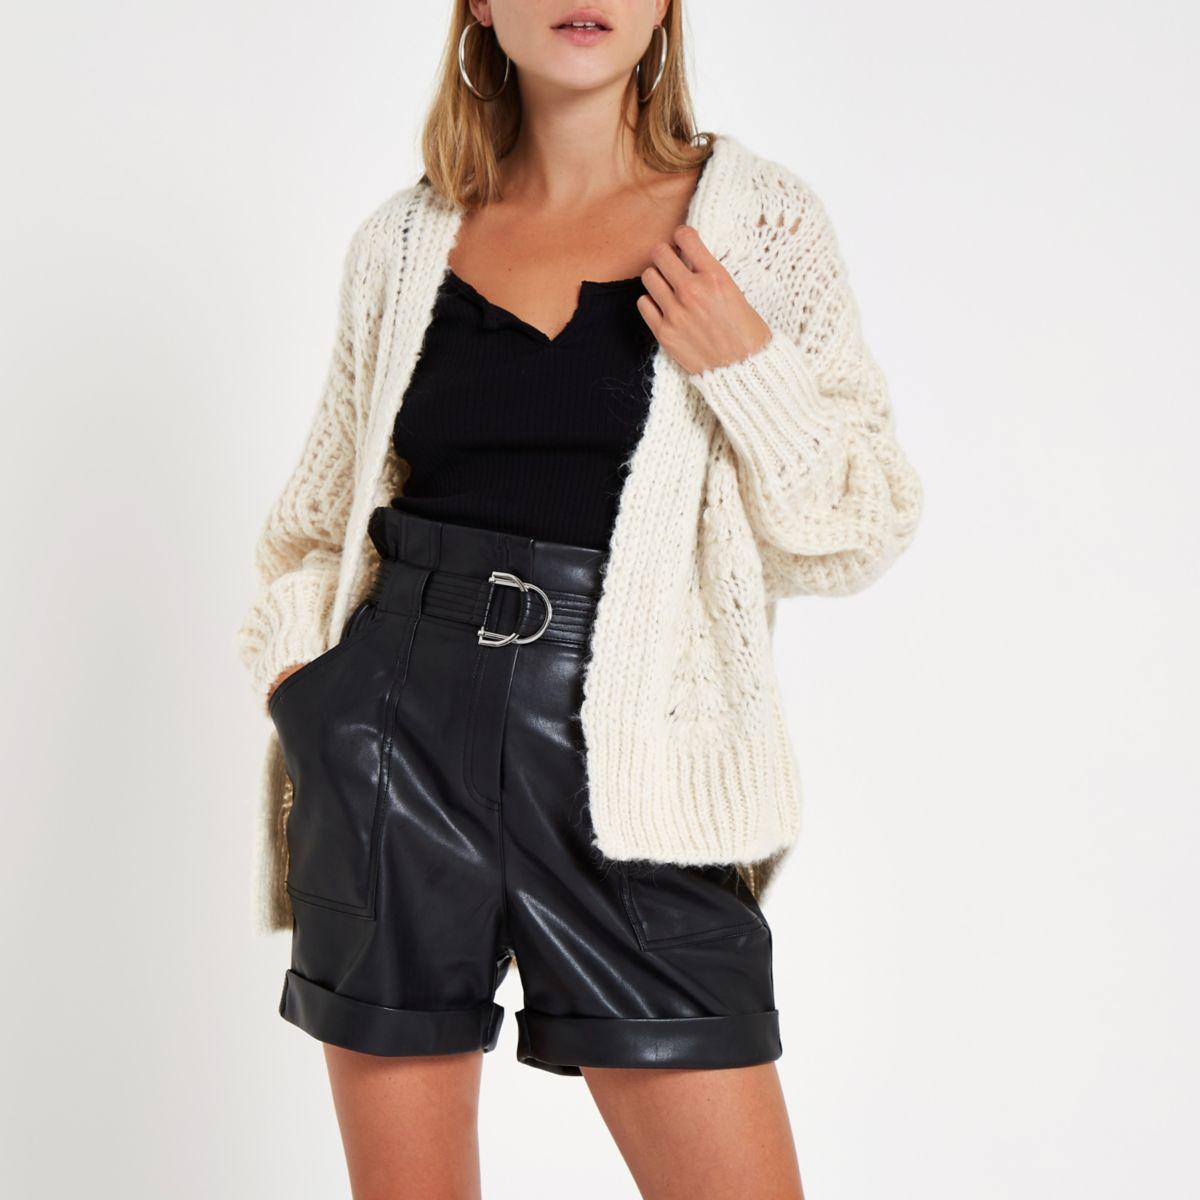 Cream knitted stitch cardigan